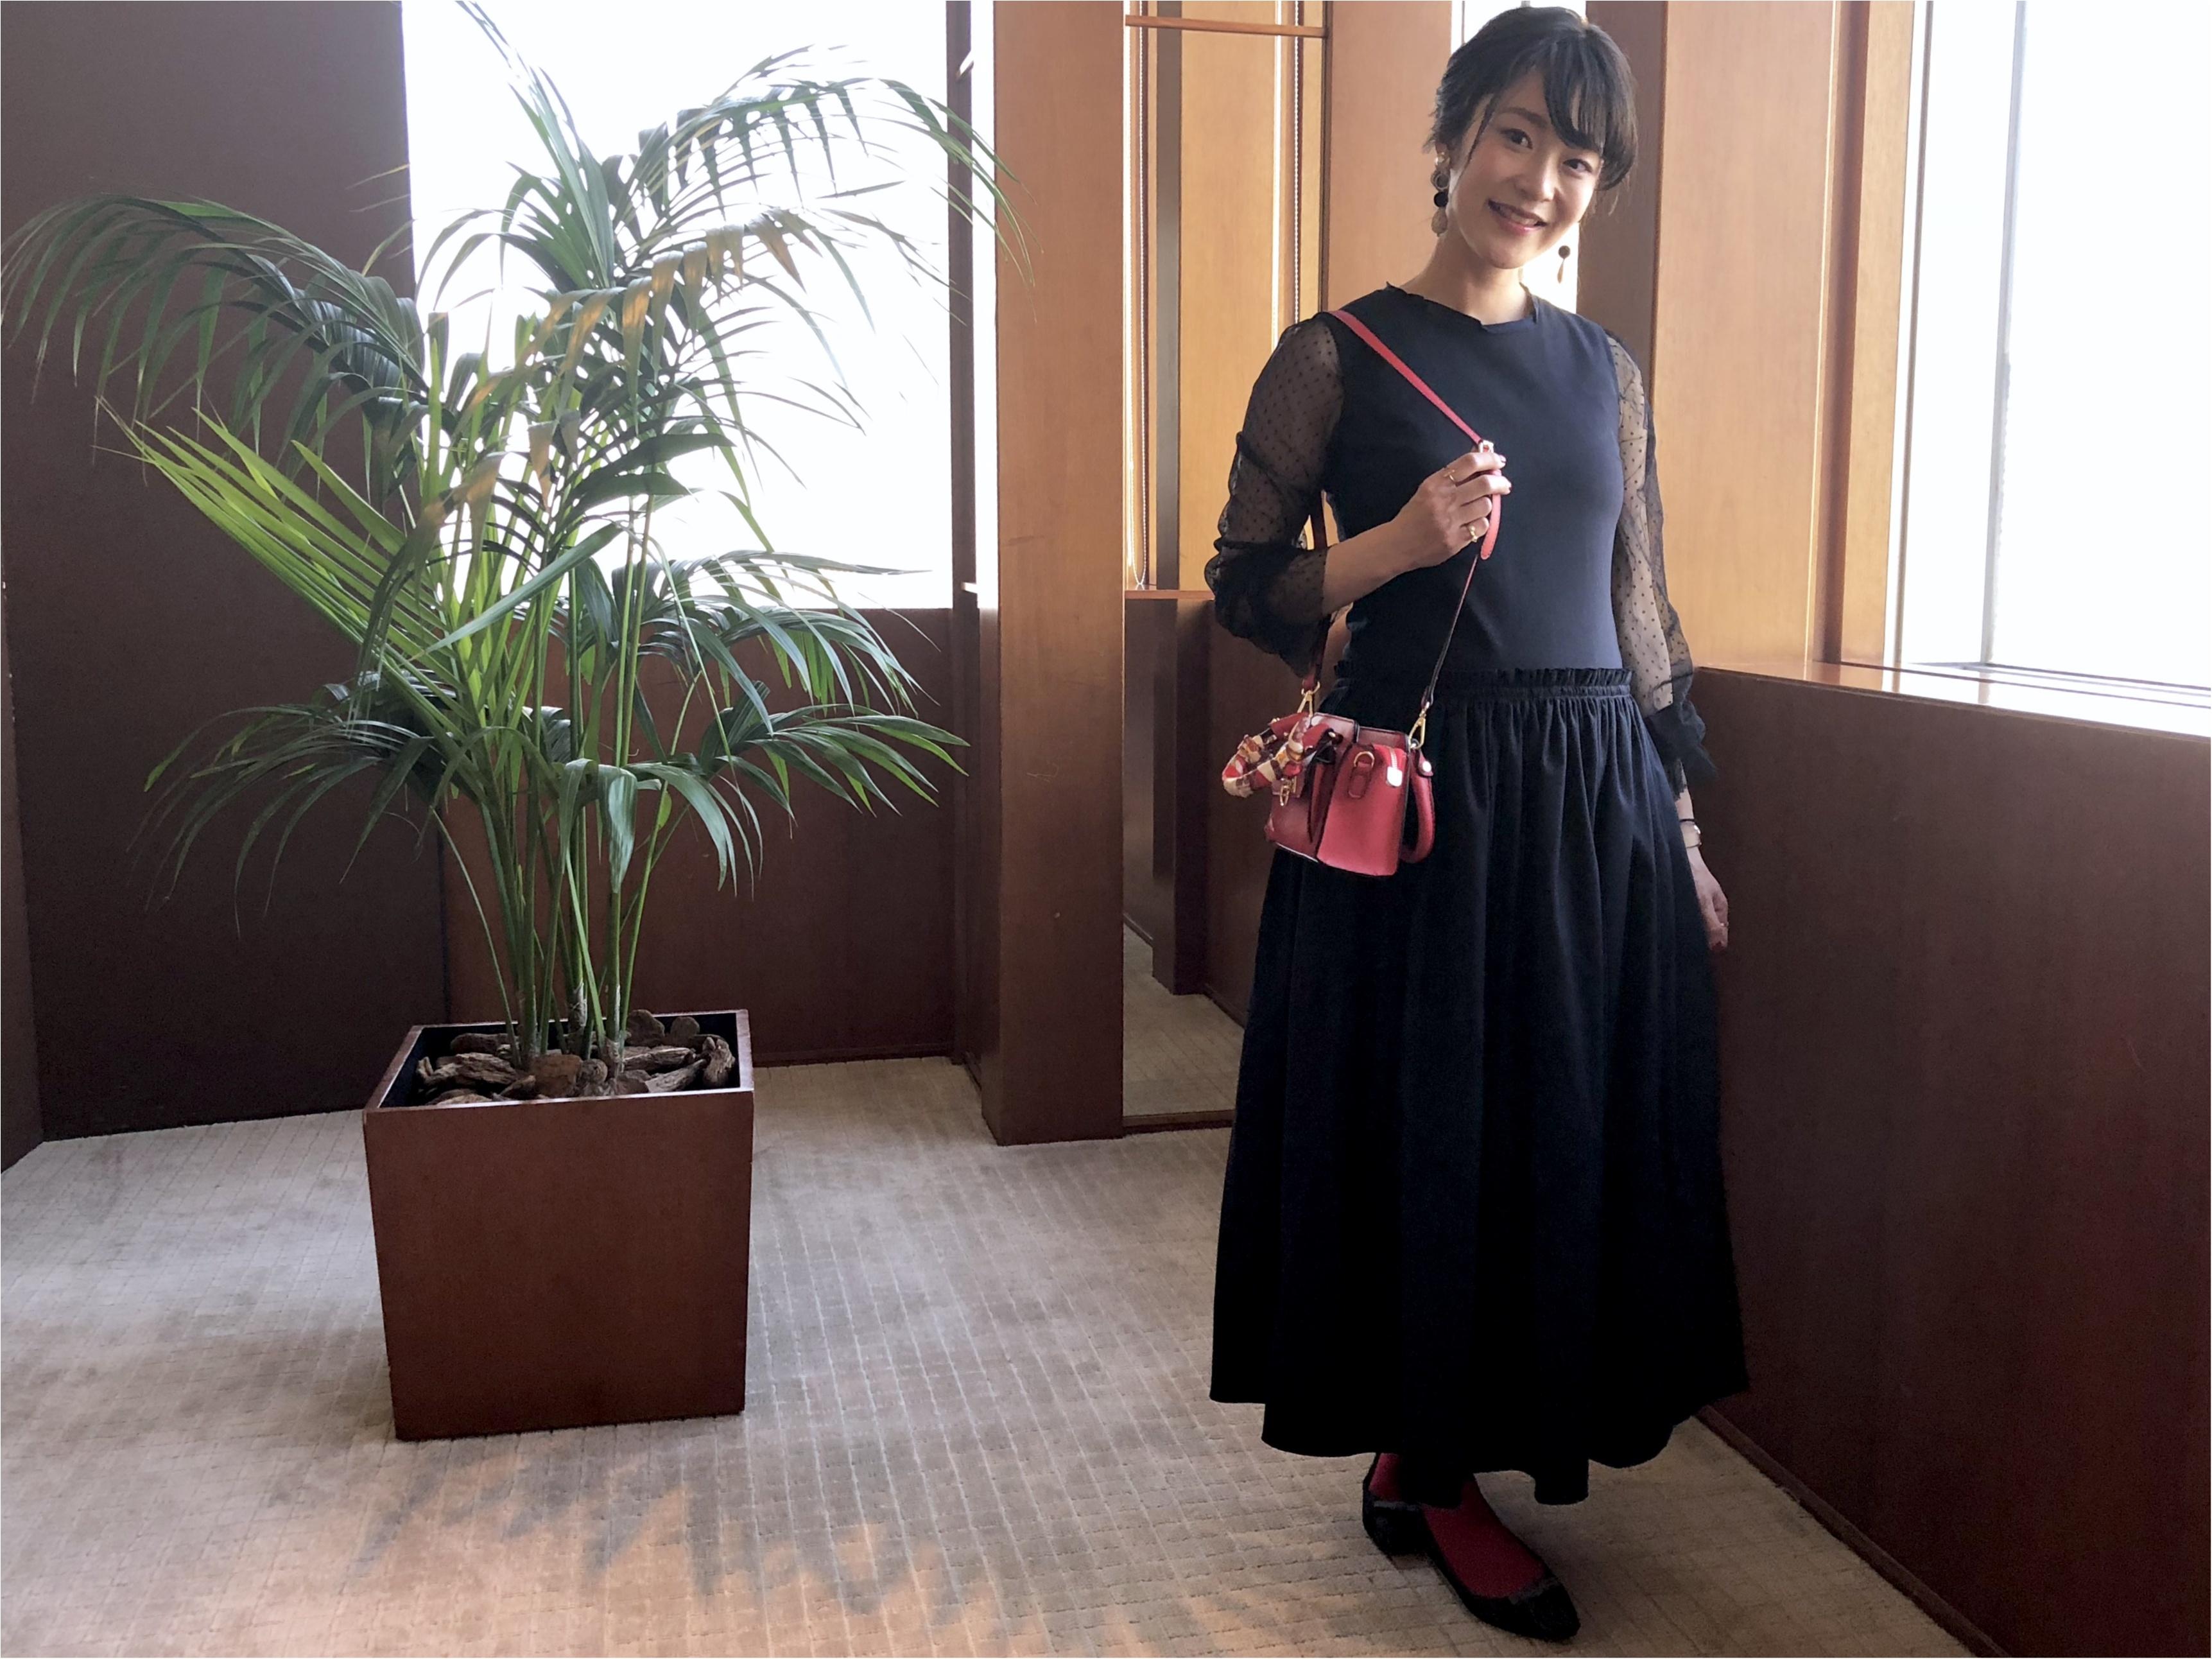 【fifth】女子会コーデの褒められアイテムは《¥1000以下の高見えバッグ》❤️_1